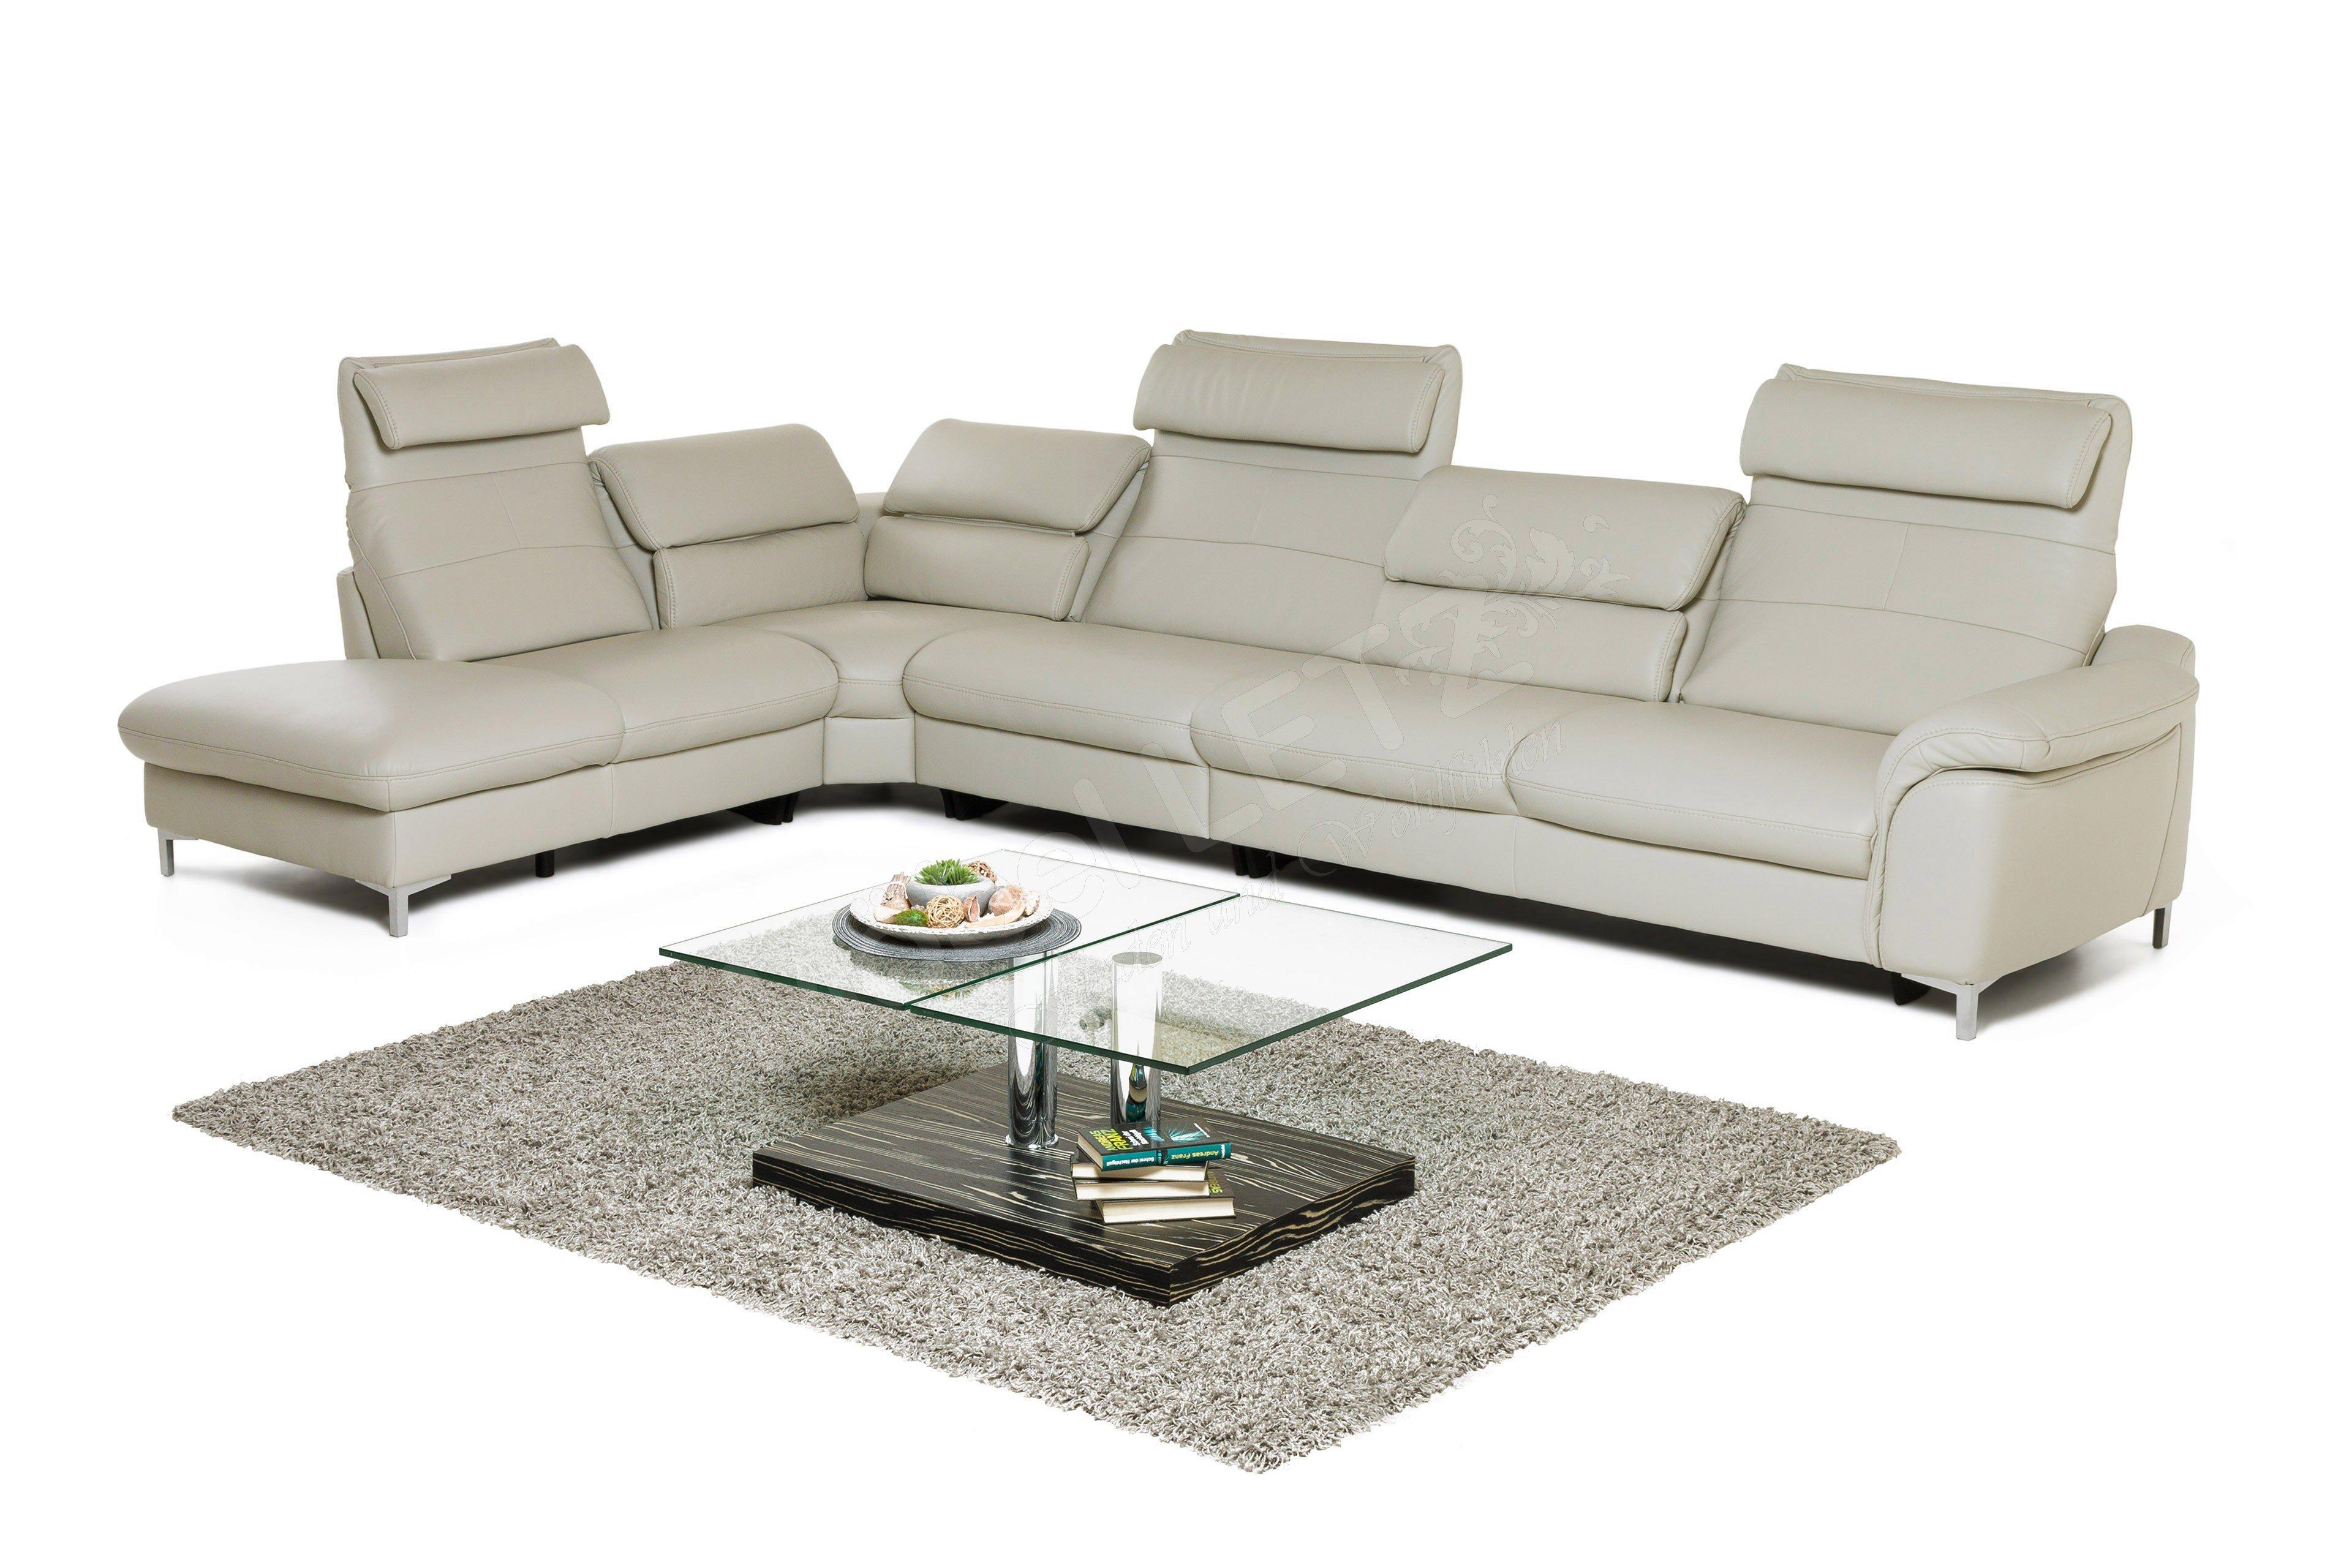 hukla rl1656 eckgarnitur in hellgrau m bel letz ihr. Black Bedroom Furniture Sets. Home Design Ideas